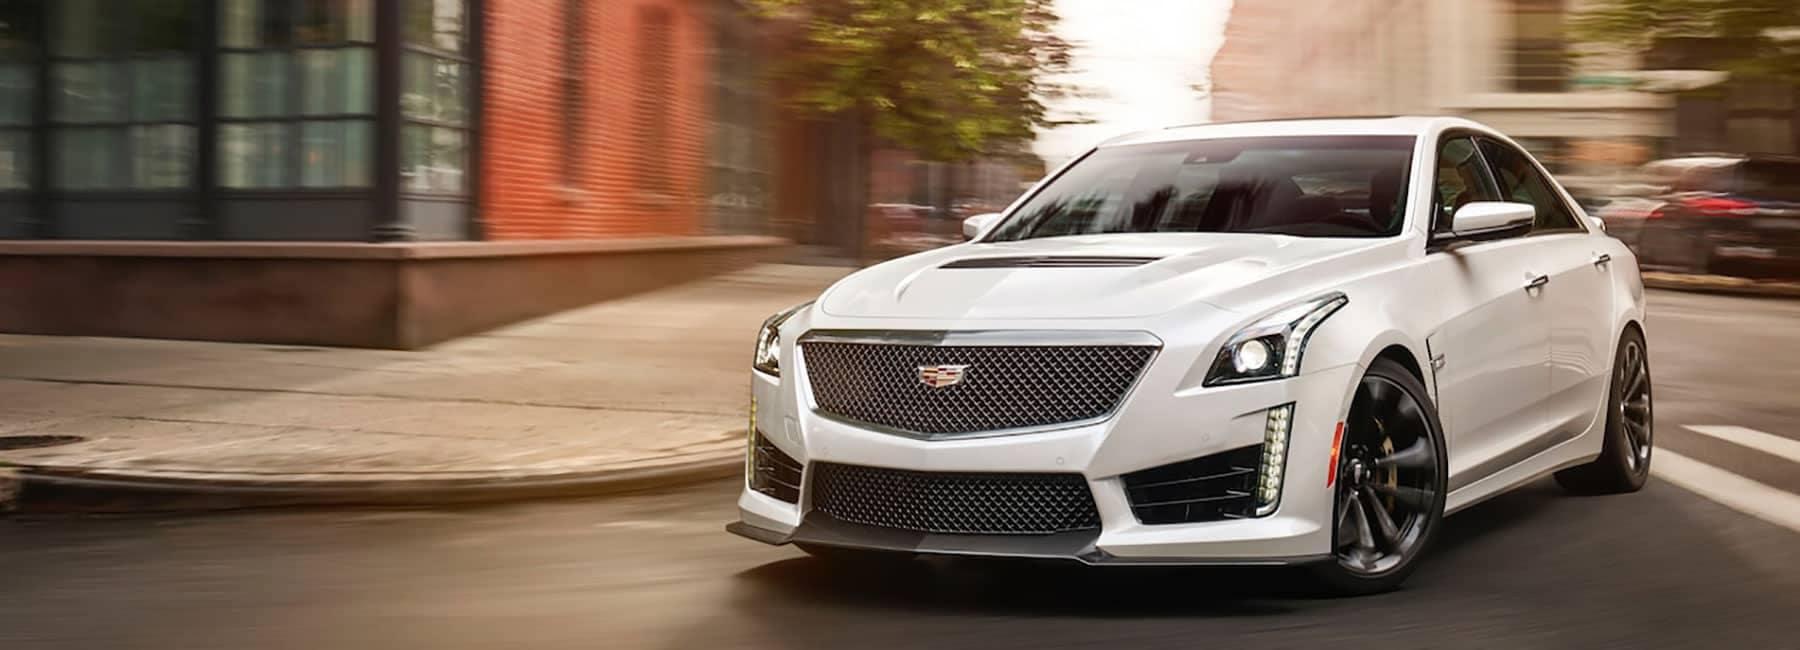 Cadillac Banner Image - White Cadillac-CTS-V-Front